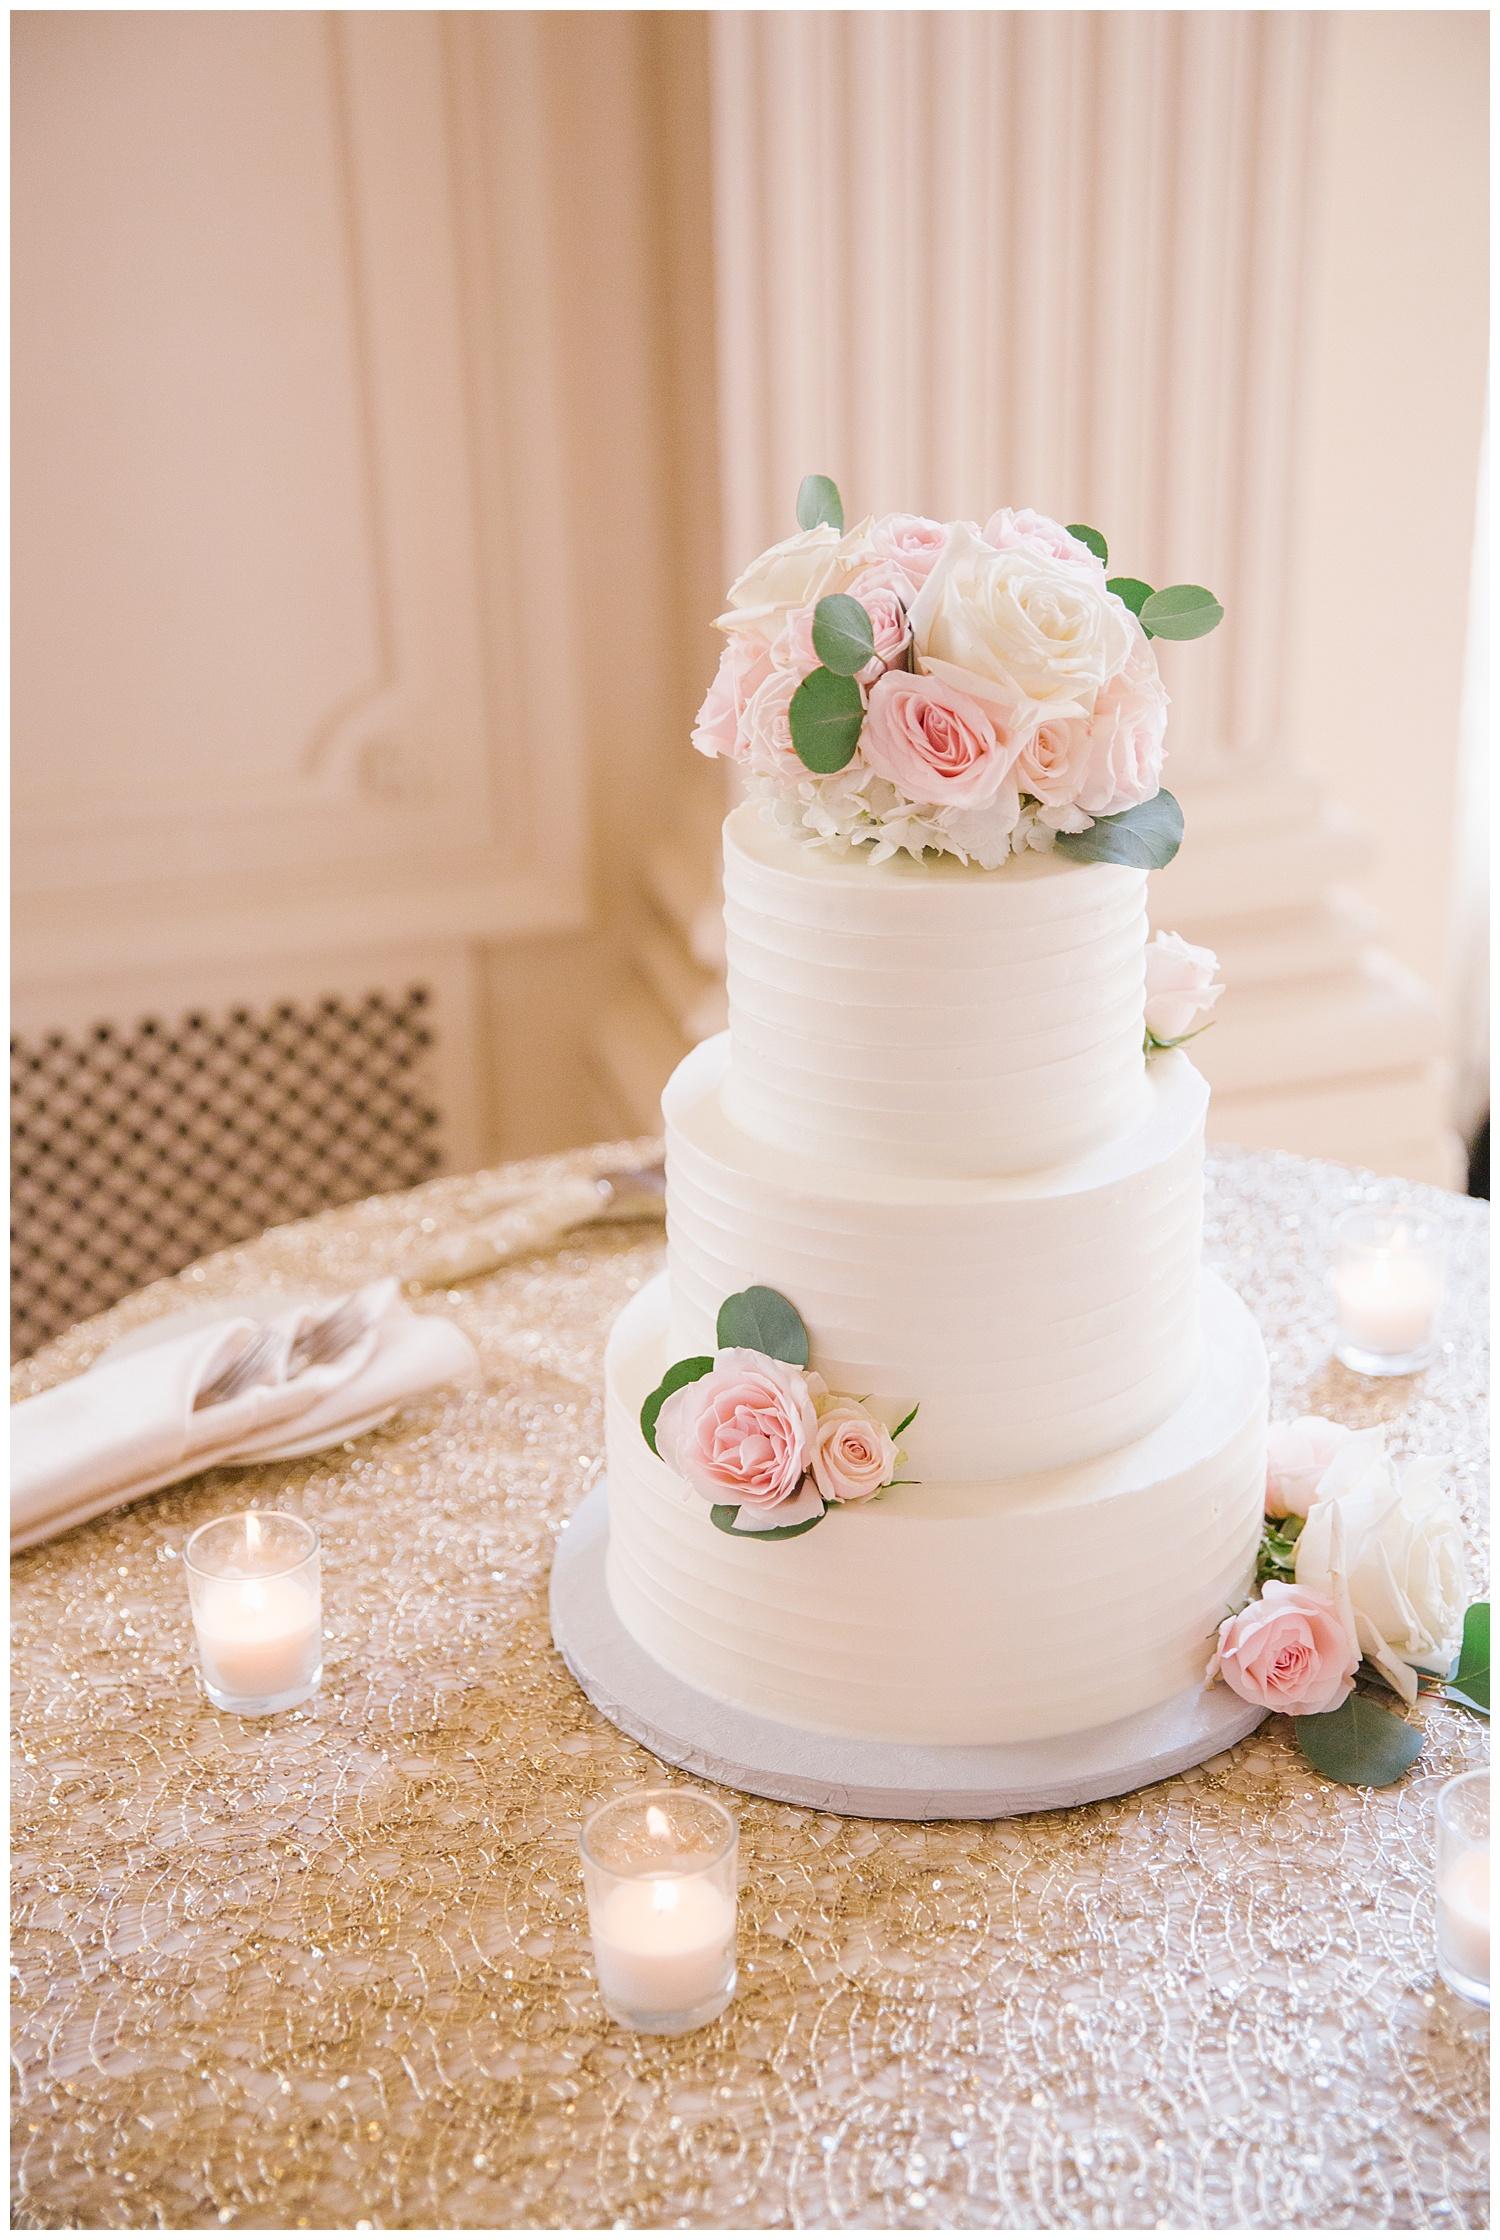 Stephen_Nathalie_Rosecliff_Mansion_Wedding_017.jpeg